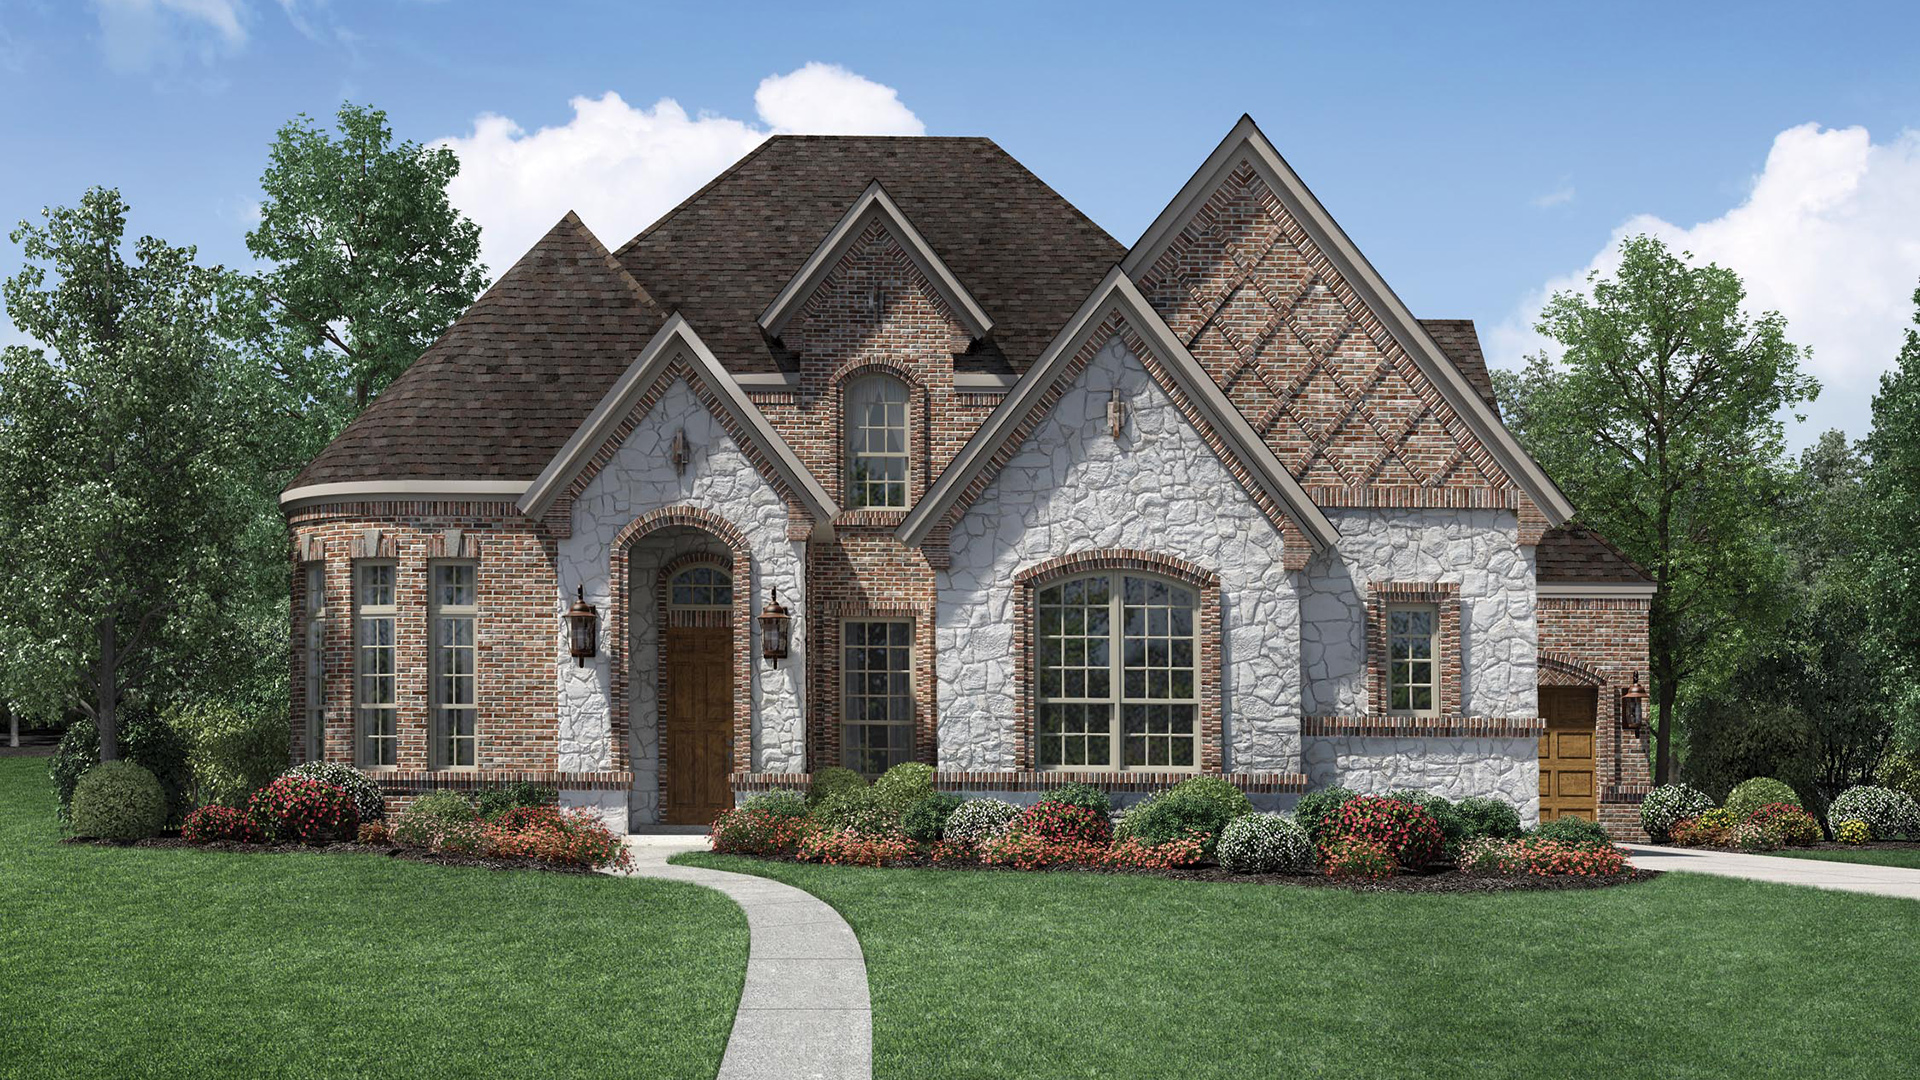 STNT_MAN_TX_3SPE_654_1_1920 Stanton Home Design on garrison home design, cobb home design, tranquility home design,